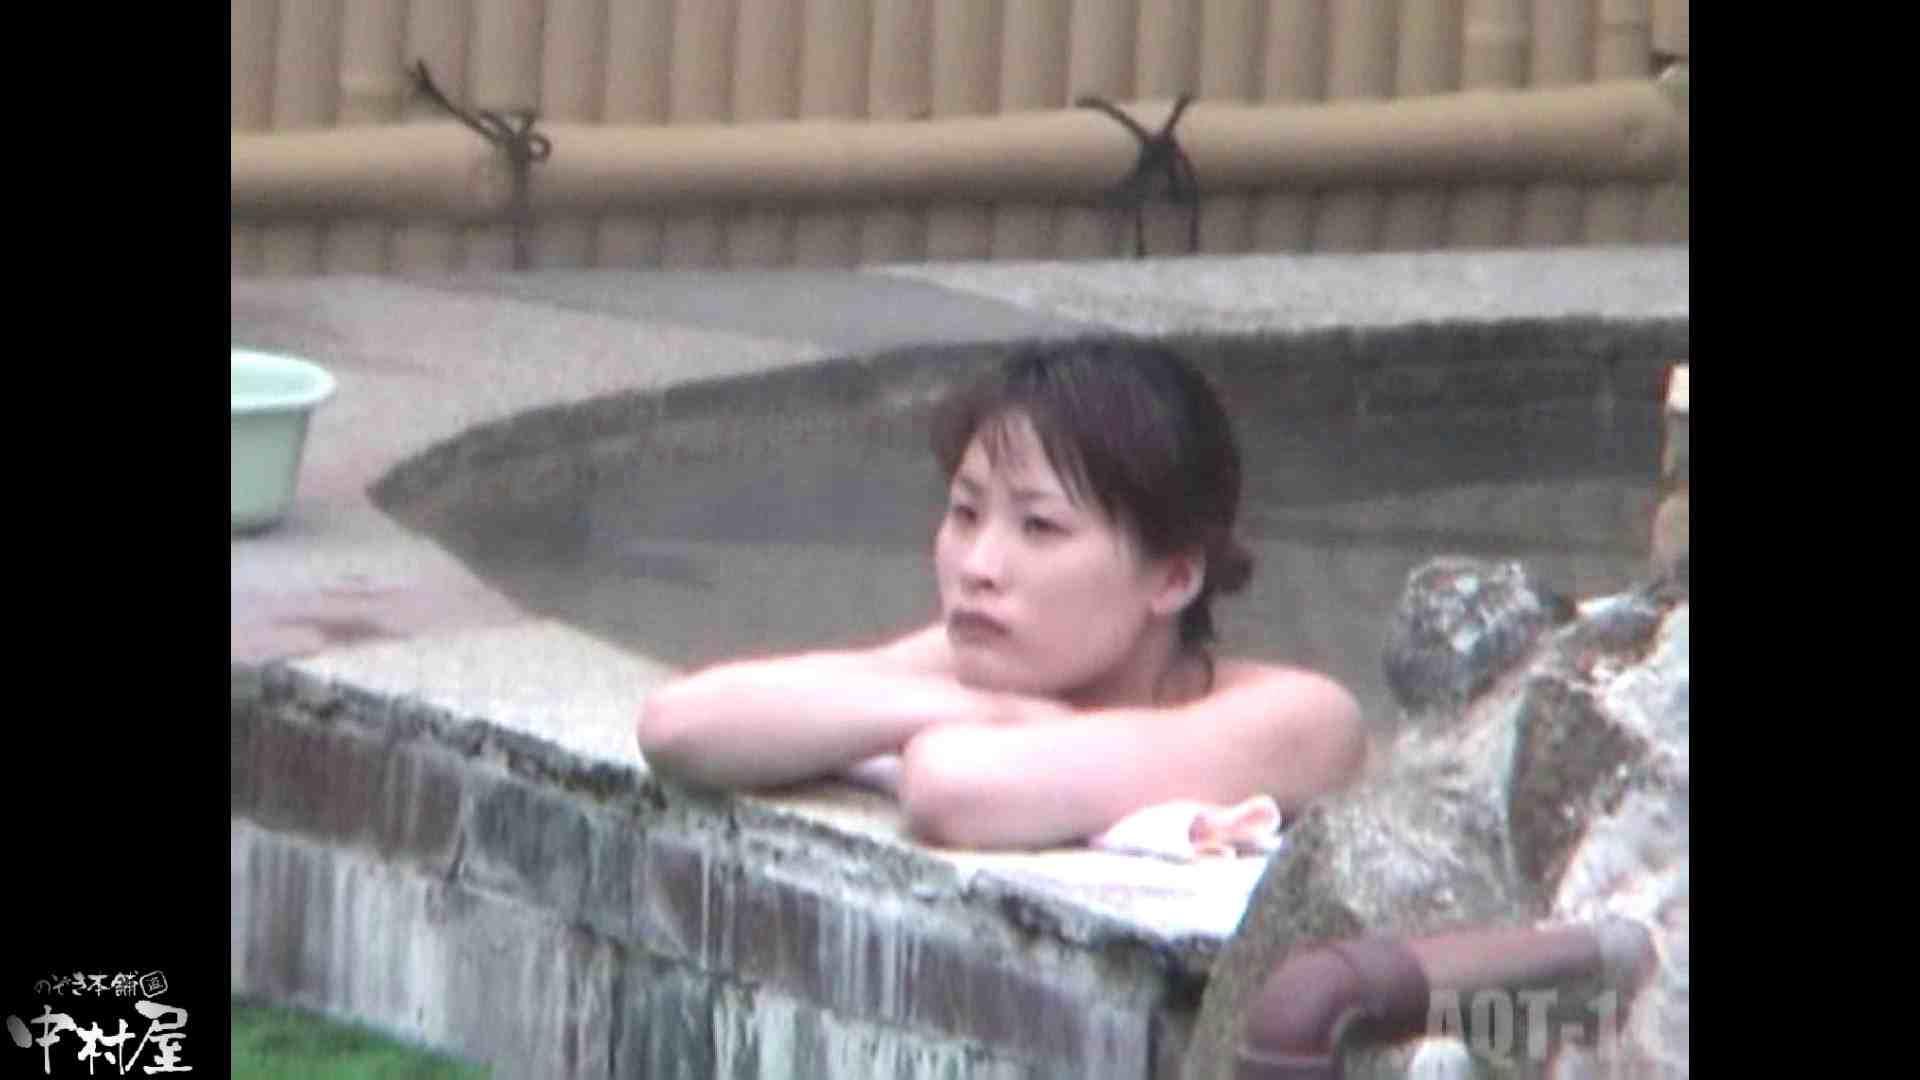 Aquaな露天風呂Vol.878潜入盗撮露天風呂十四判湯 其の三 潜入  48連発 16